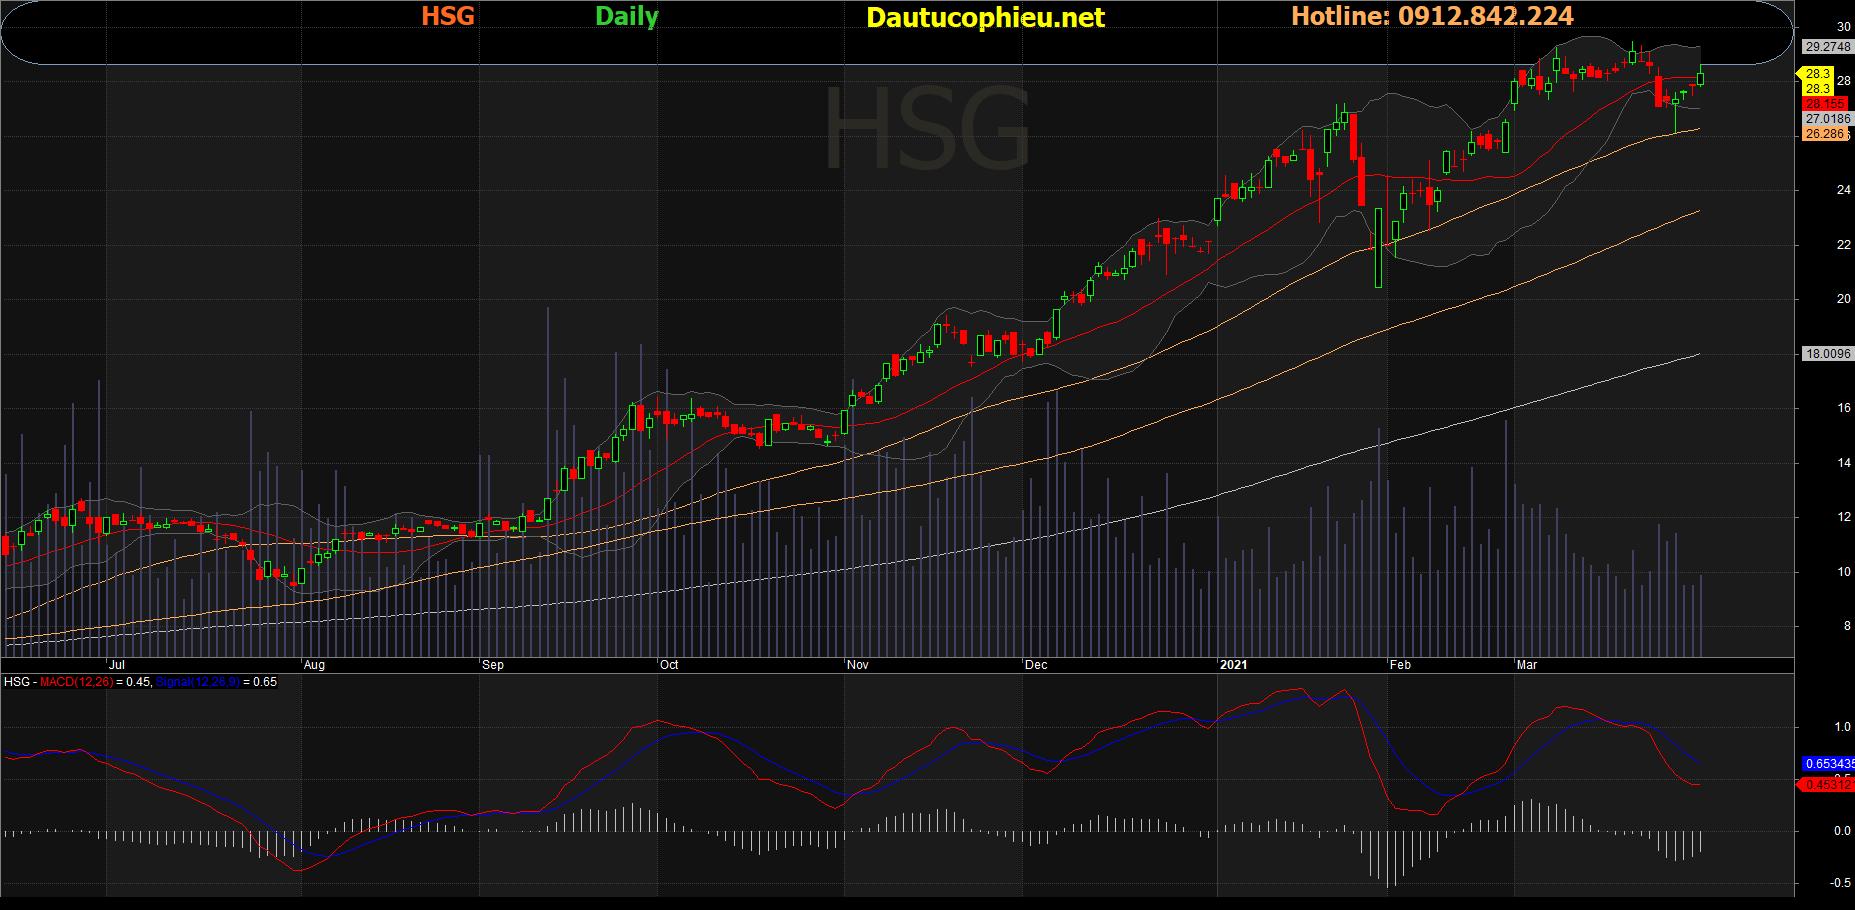 Cổ phiếu HSG